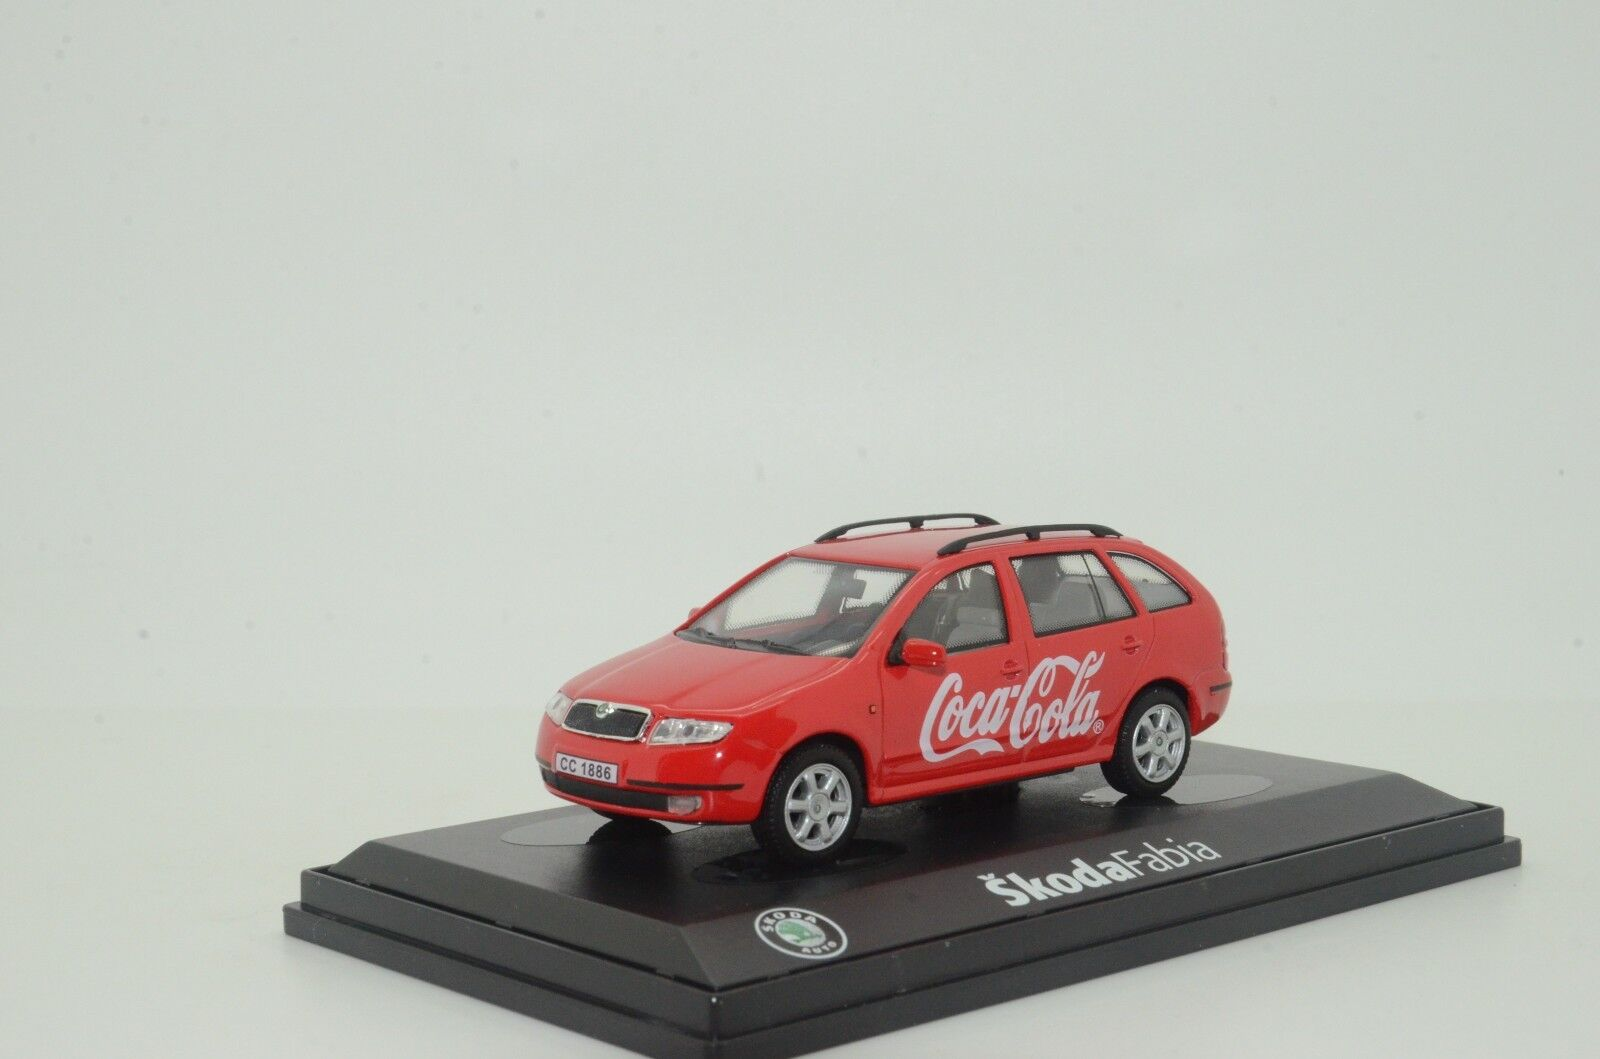 SKODA Fabia Coca Cola Abrex 1 43